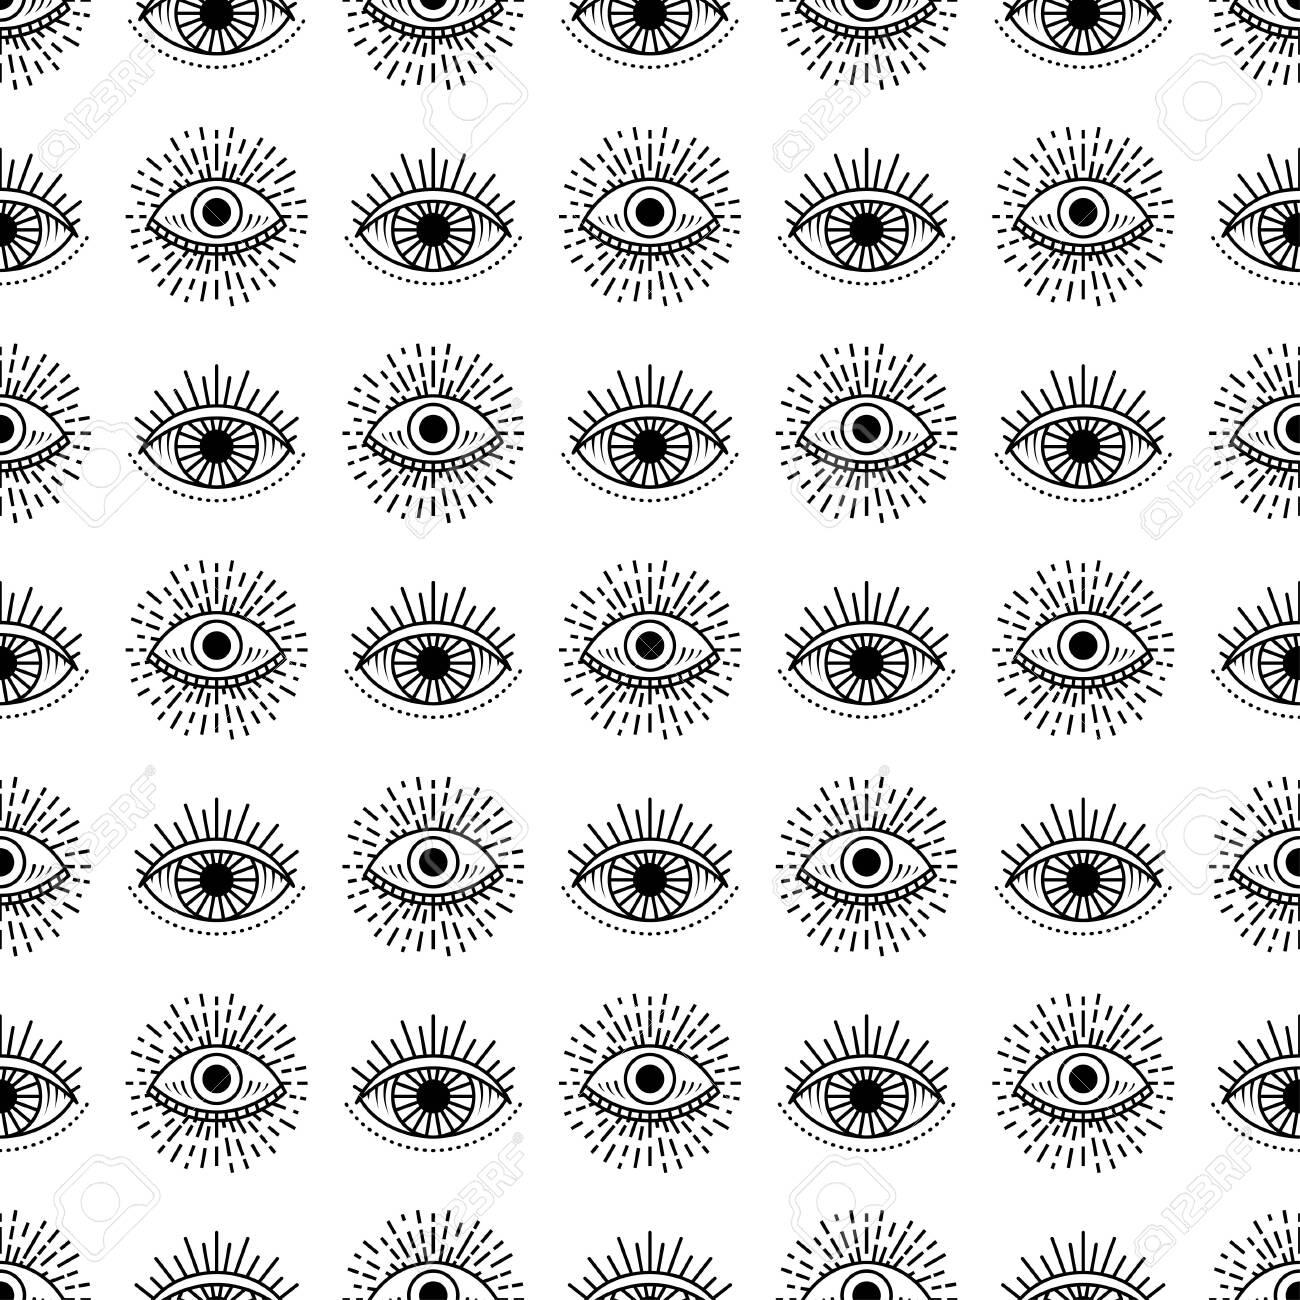 Seamless pattern with hand drawn eye, illustration - 150653027